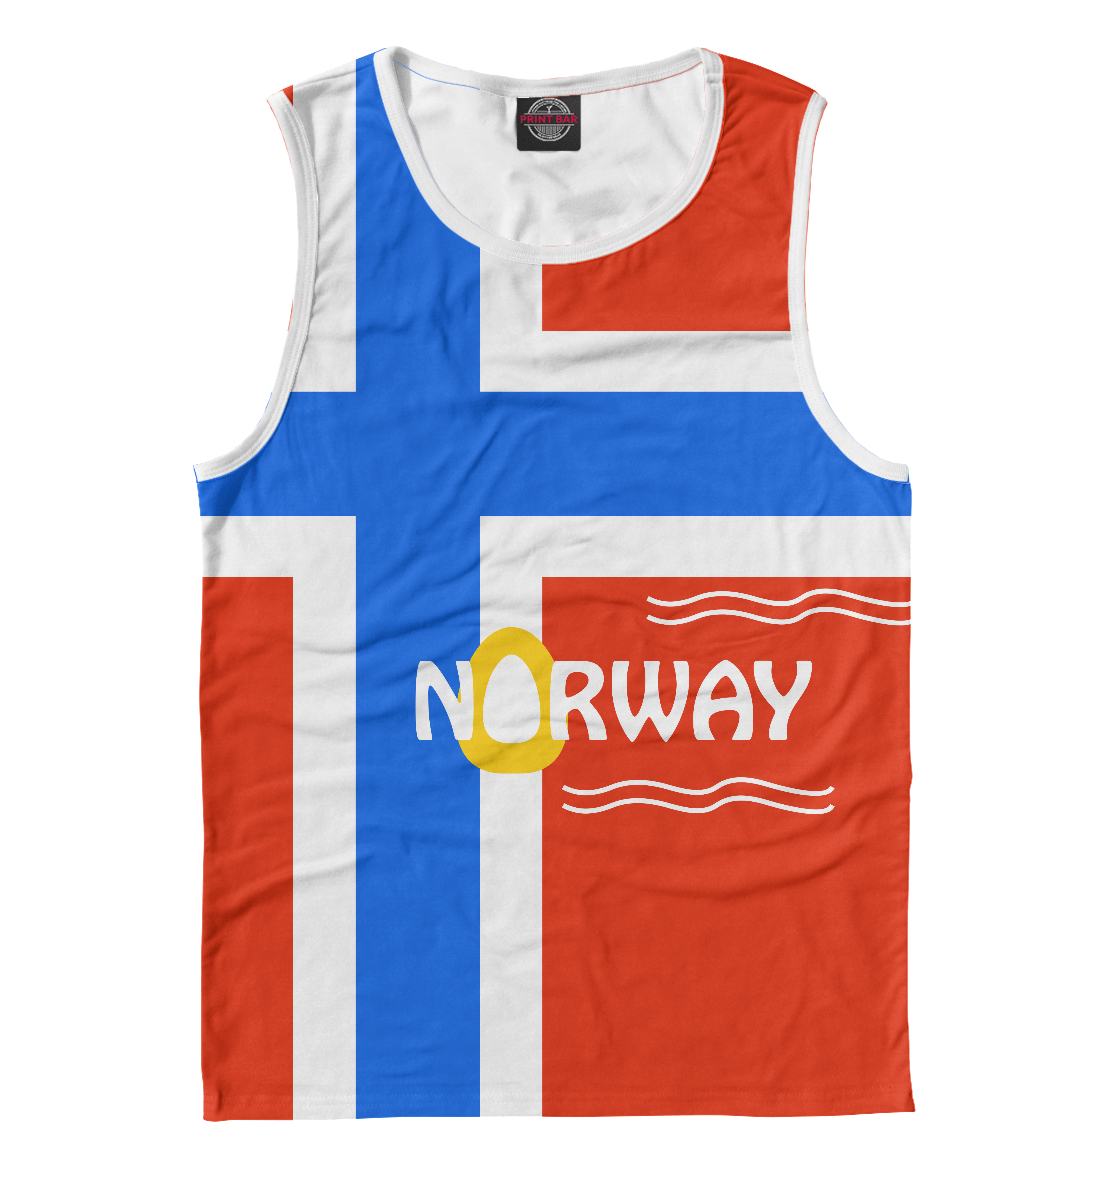 Купить Норвегия, Printbar, Майки, CTS-292150-may-2